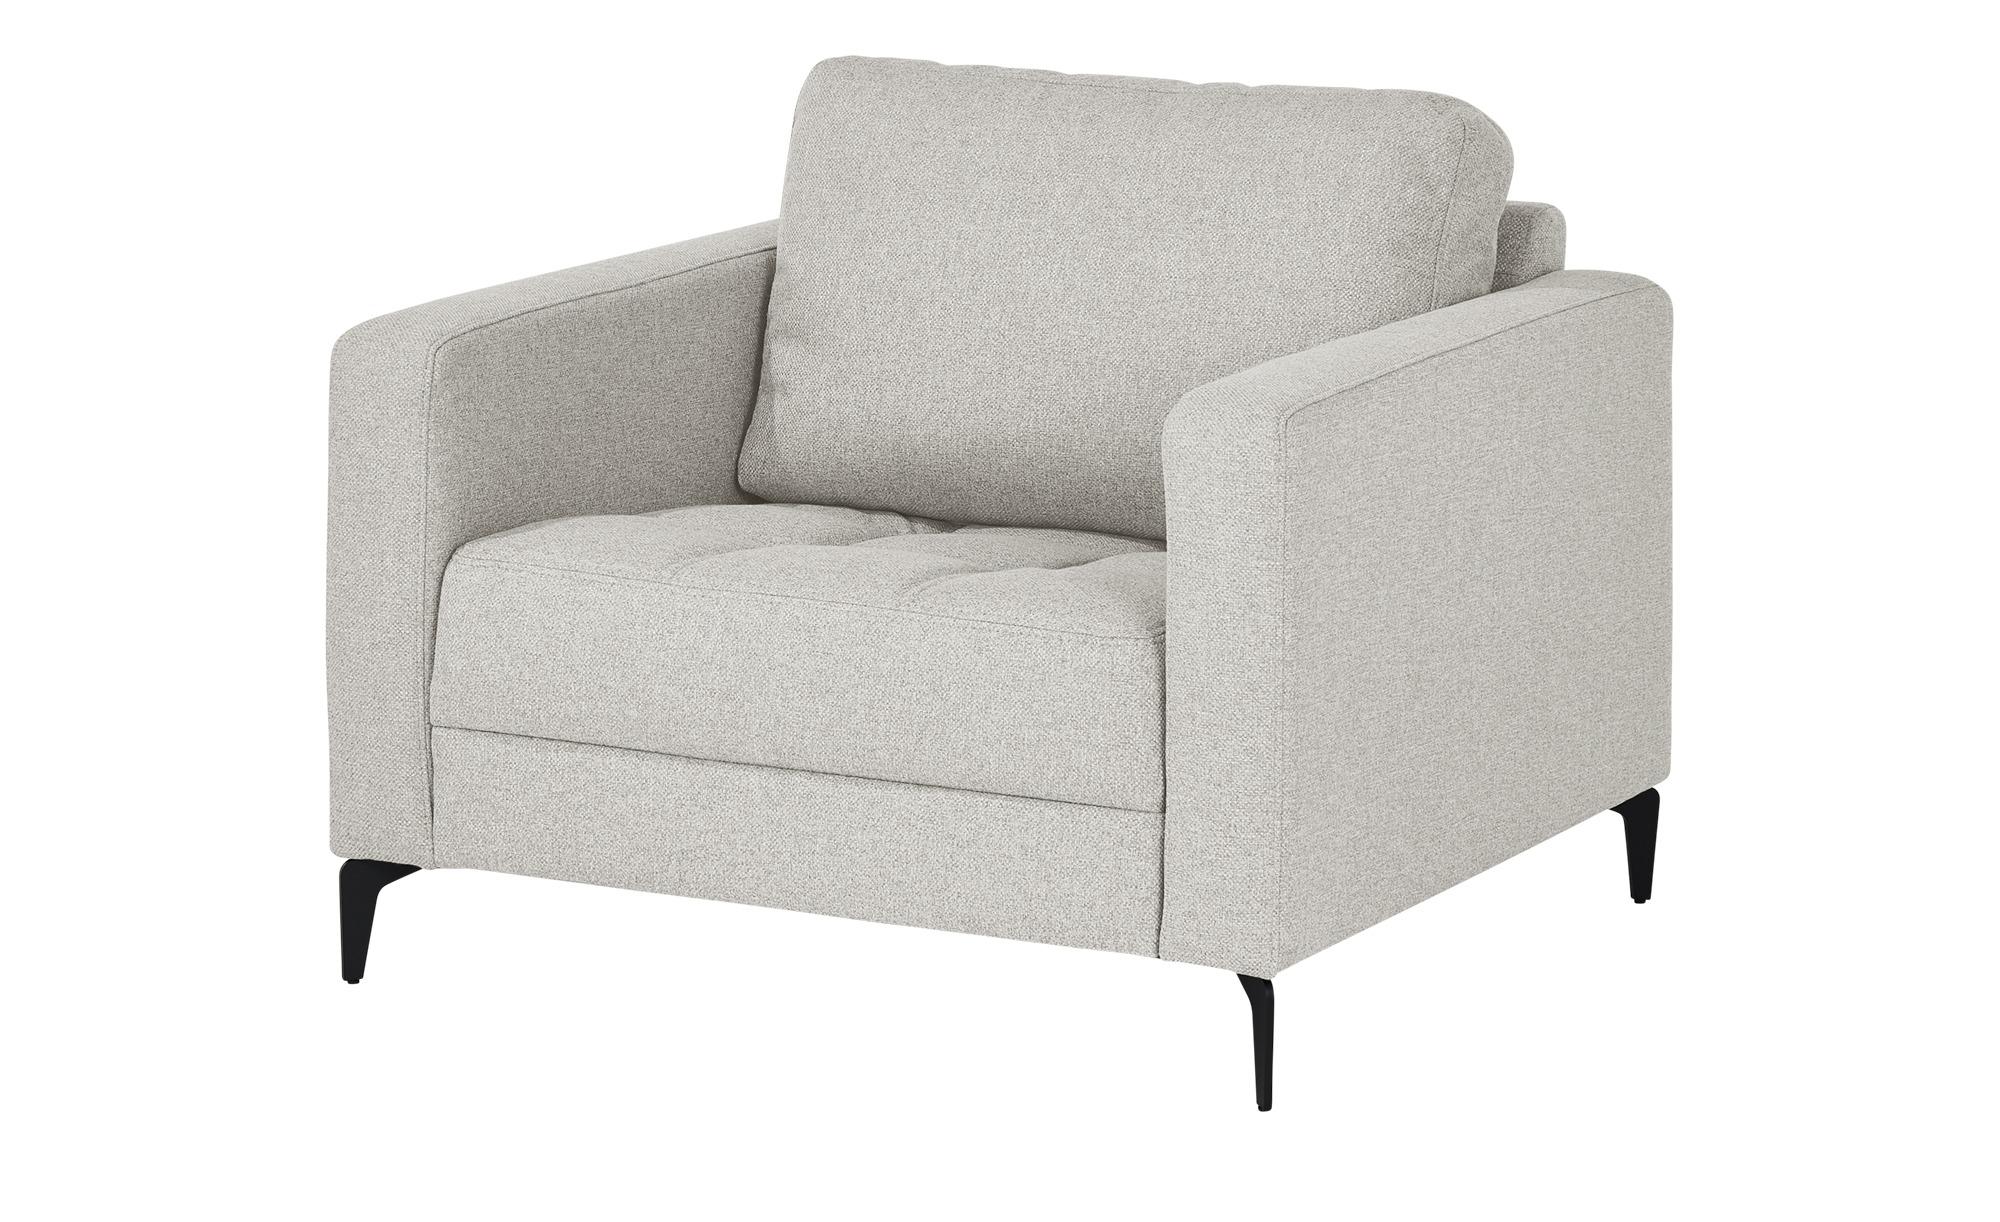 smart Sessel  Gesa ¦ grau ¦ Maße (cm): B: 102 H: 83 T: 91 Polstermöbel > Sofas > Sitzgruppen - Höffner